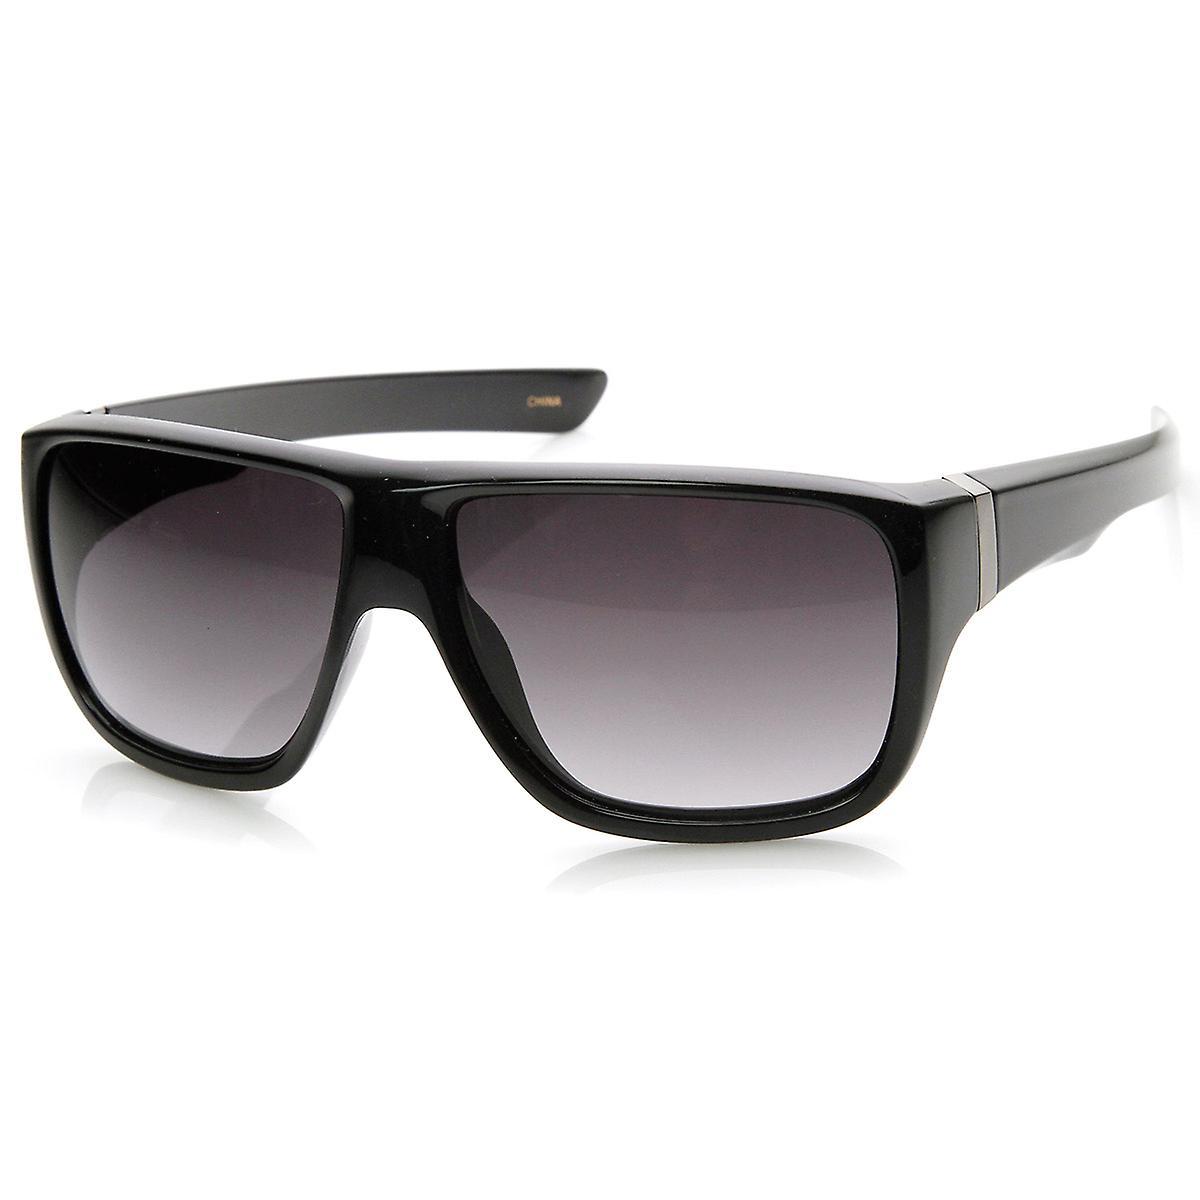 1f42a5af4 Premium Quality Large Flat Top Aviator Sunglasses   Fruugo